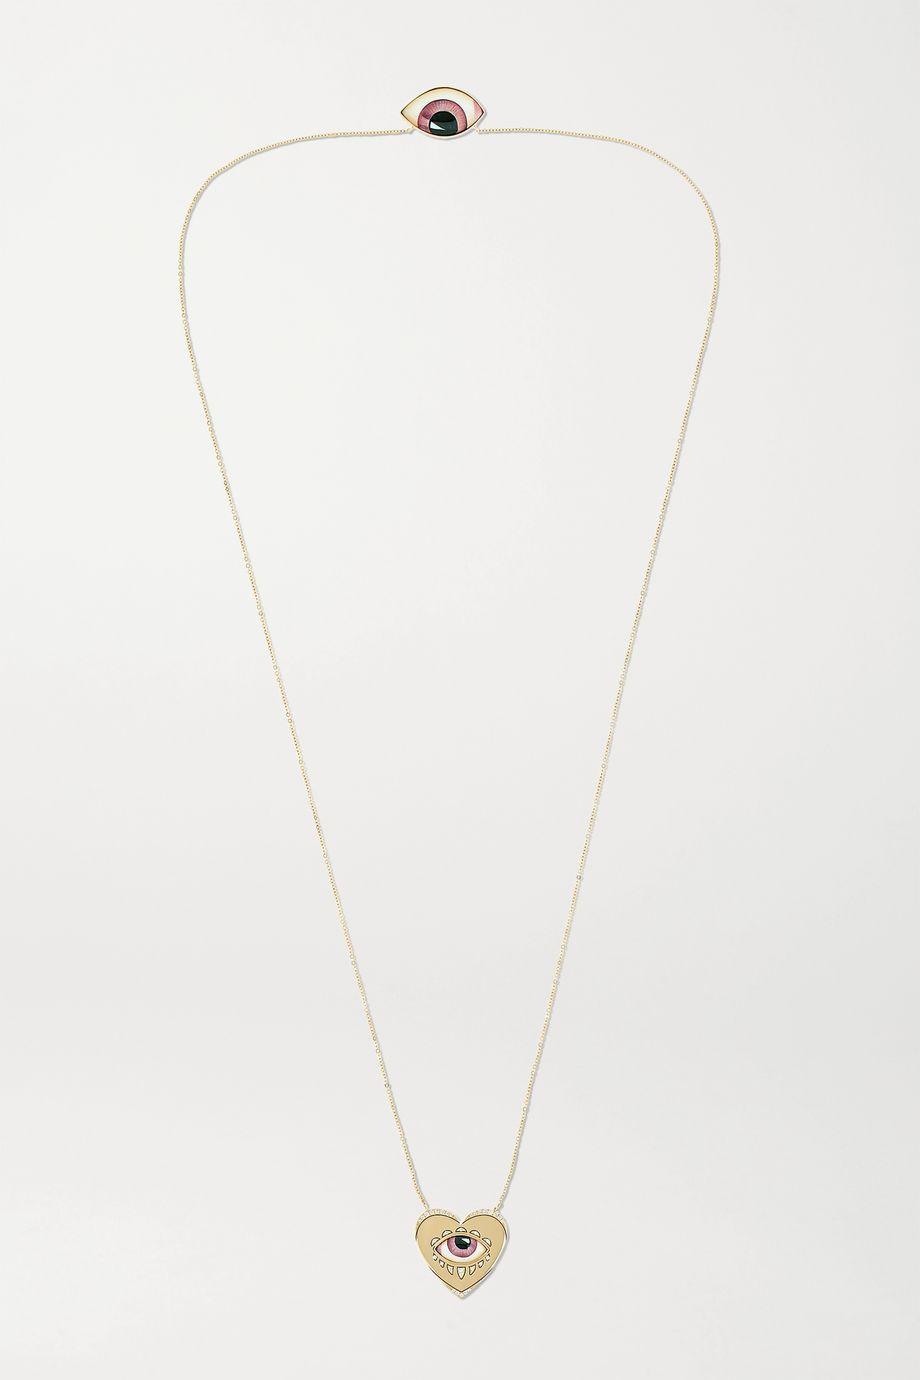 Lito + Racil 14-karat gold, enamel and diamond necklace